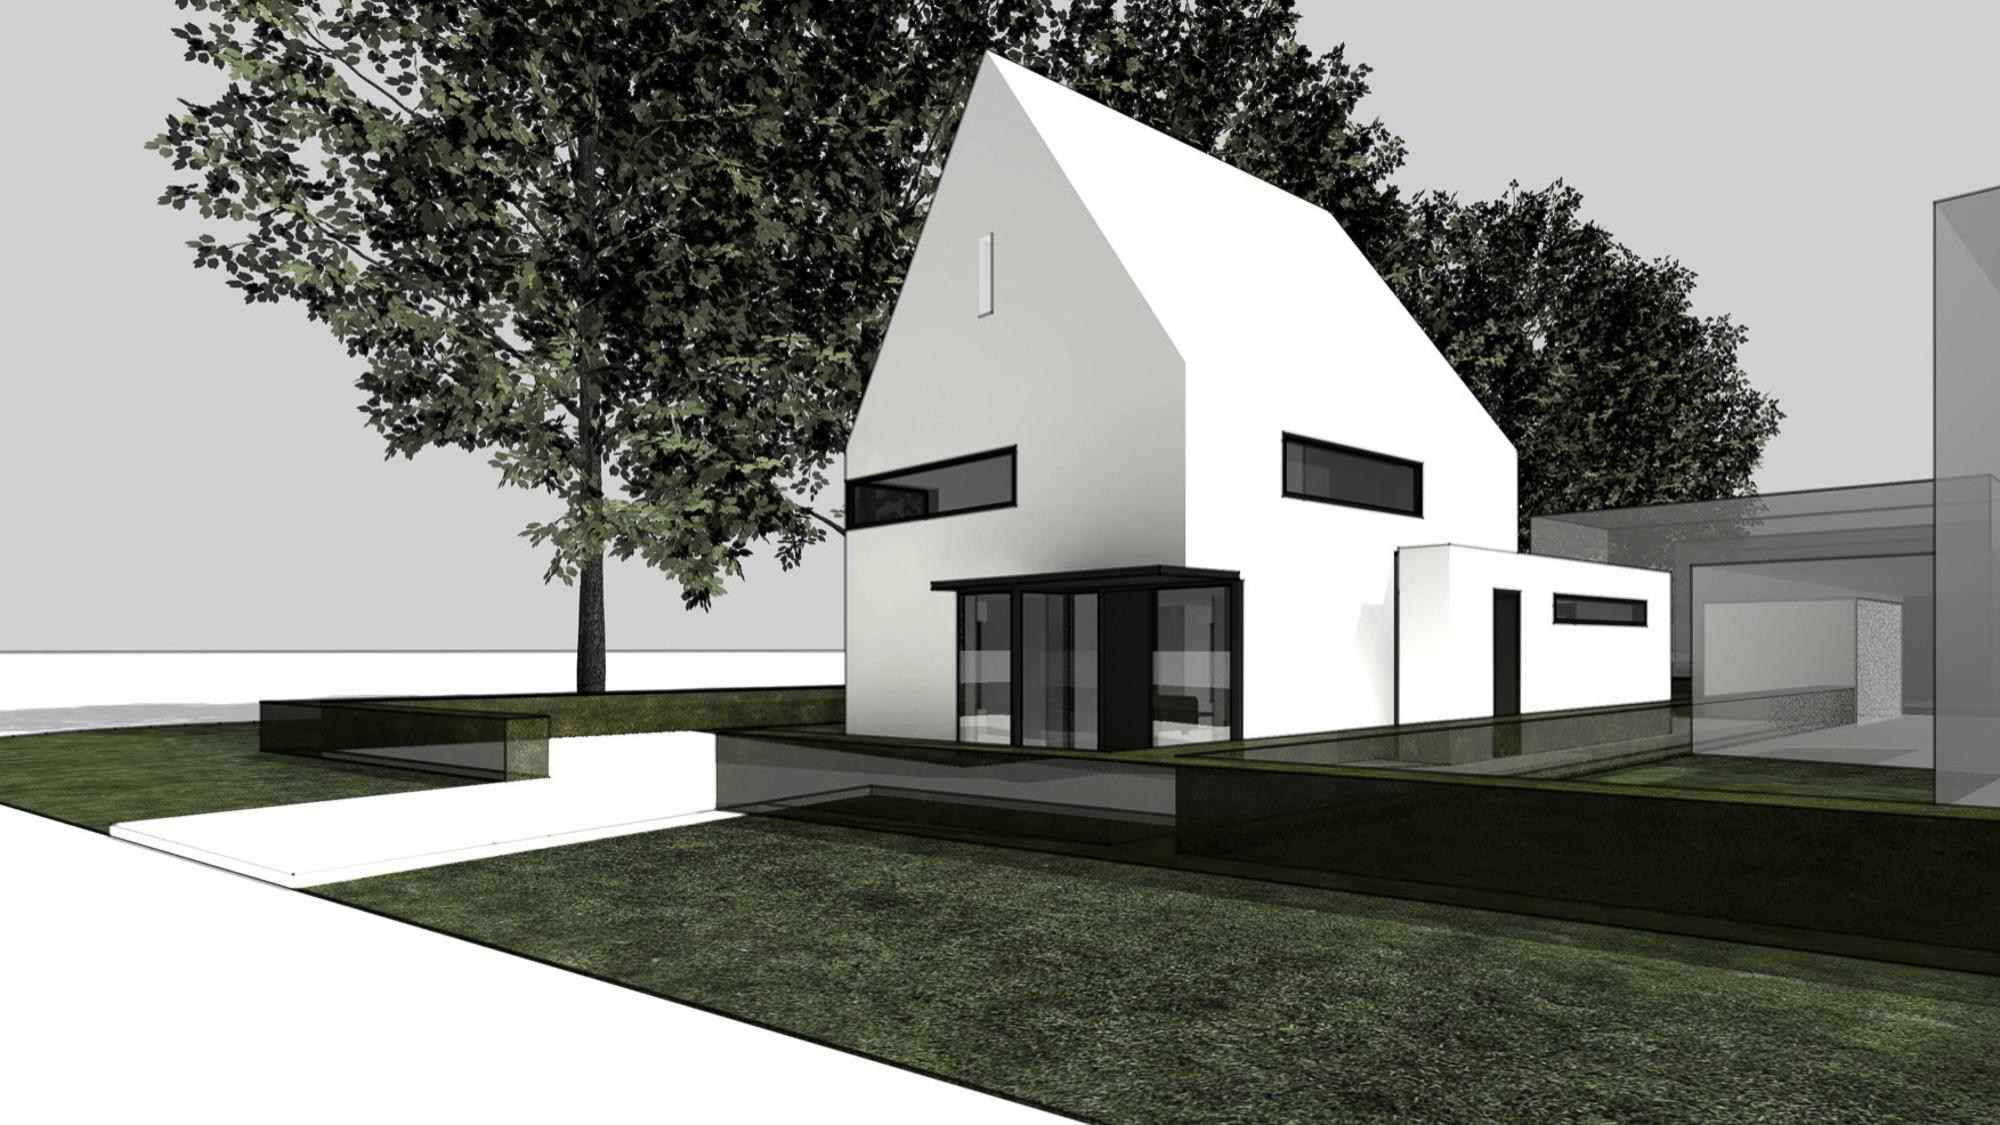 P15-009 VKA_Schetsplan familie Balkenende_2